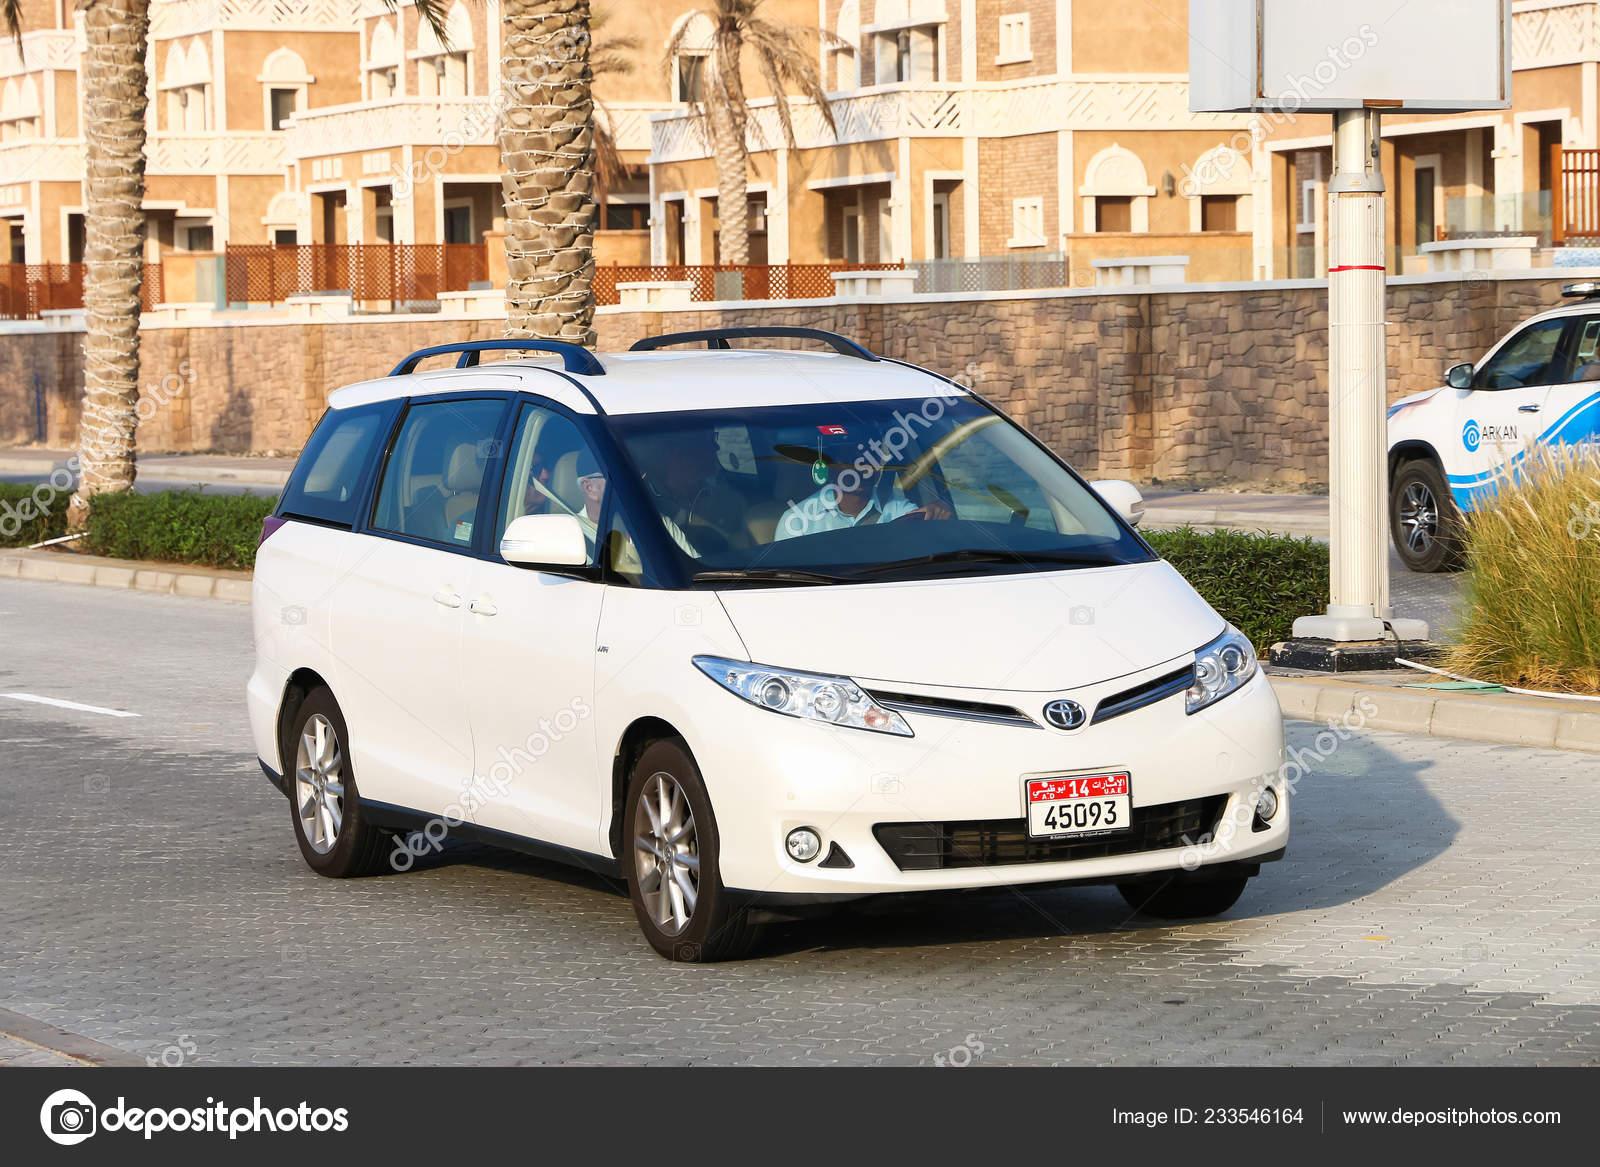 Kelebihan Toyota Previa 2018 Murah Berkualitas